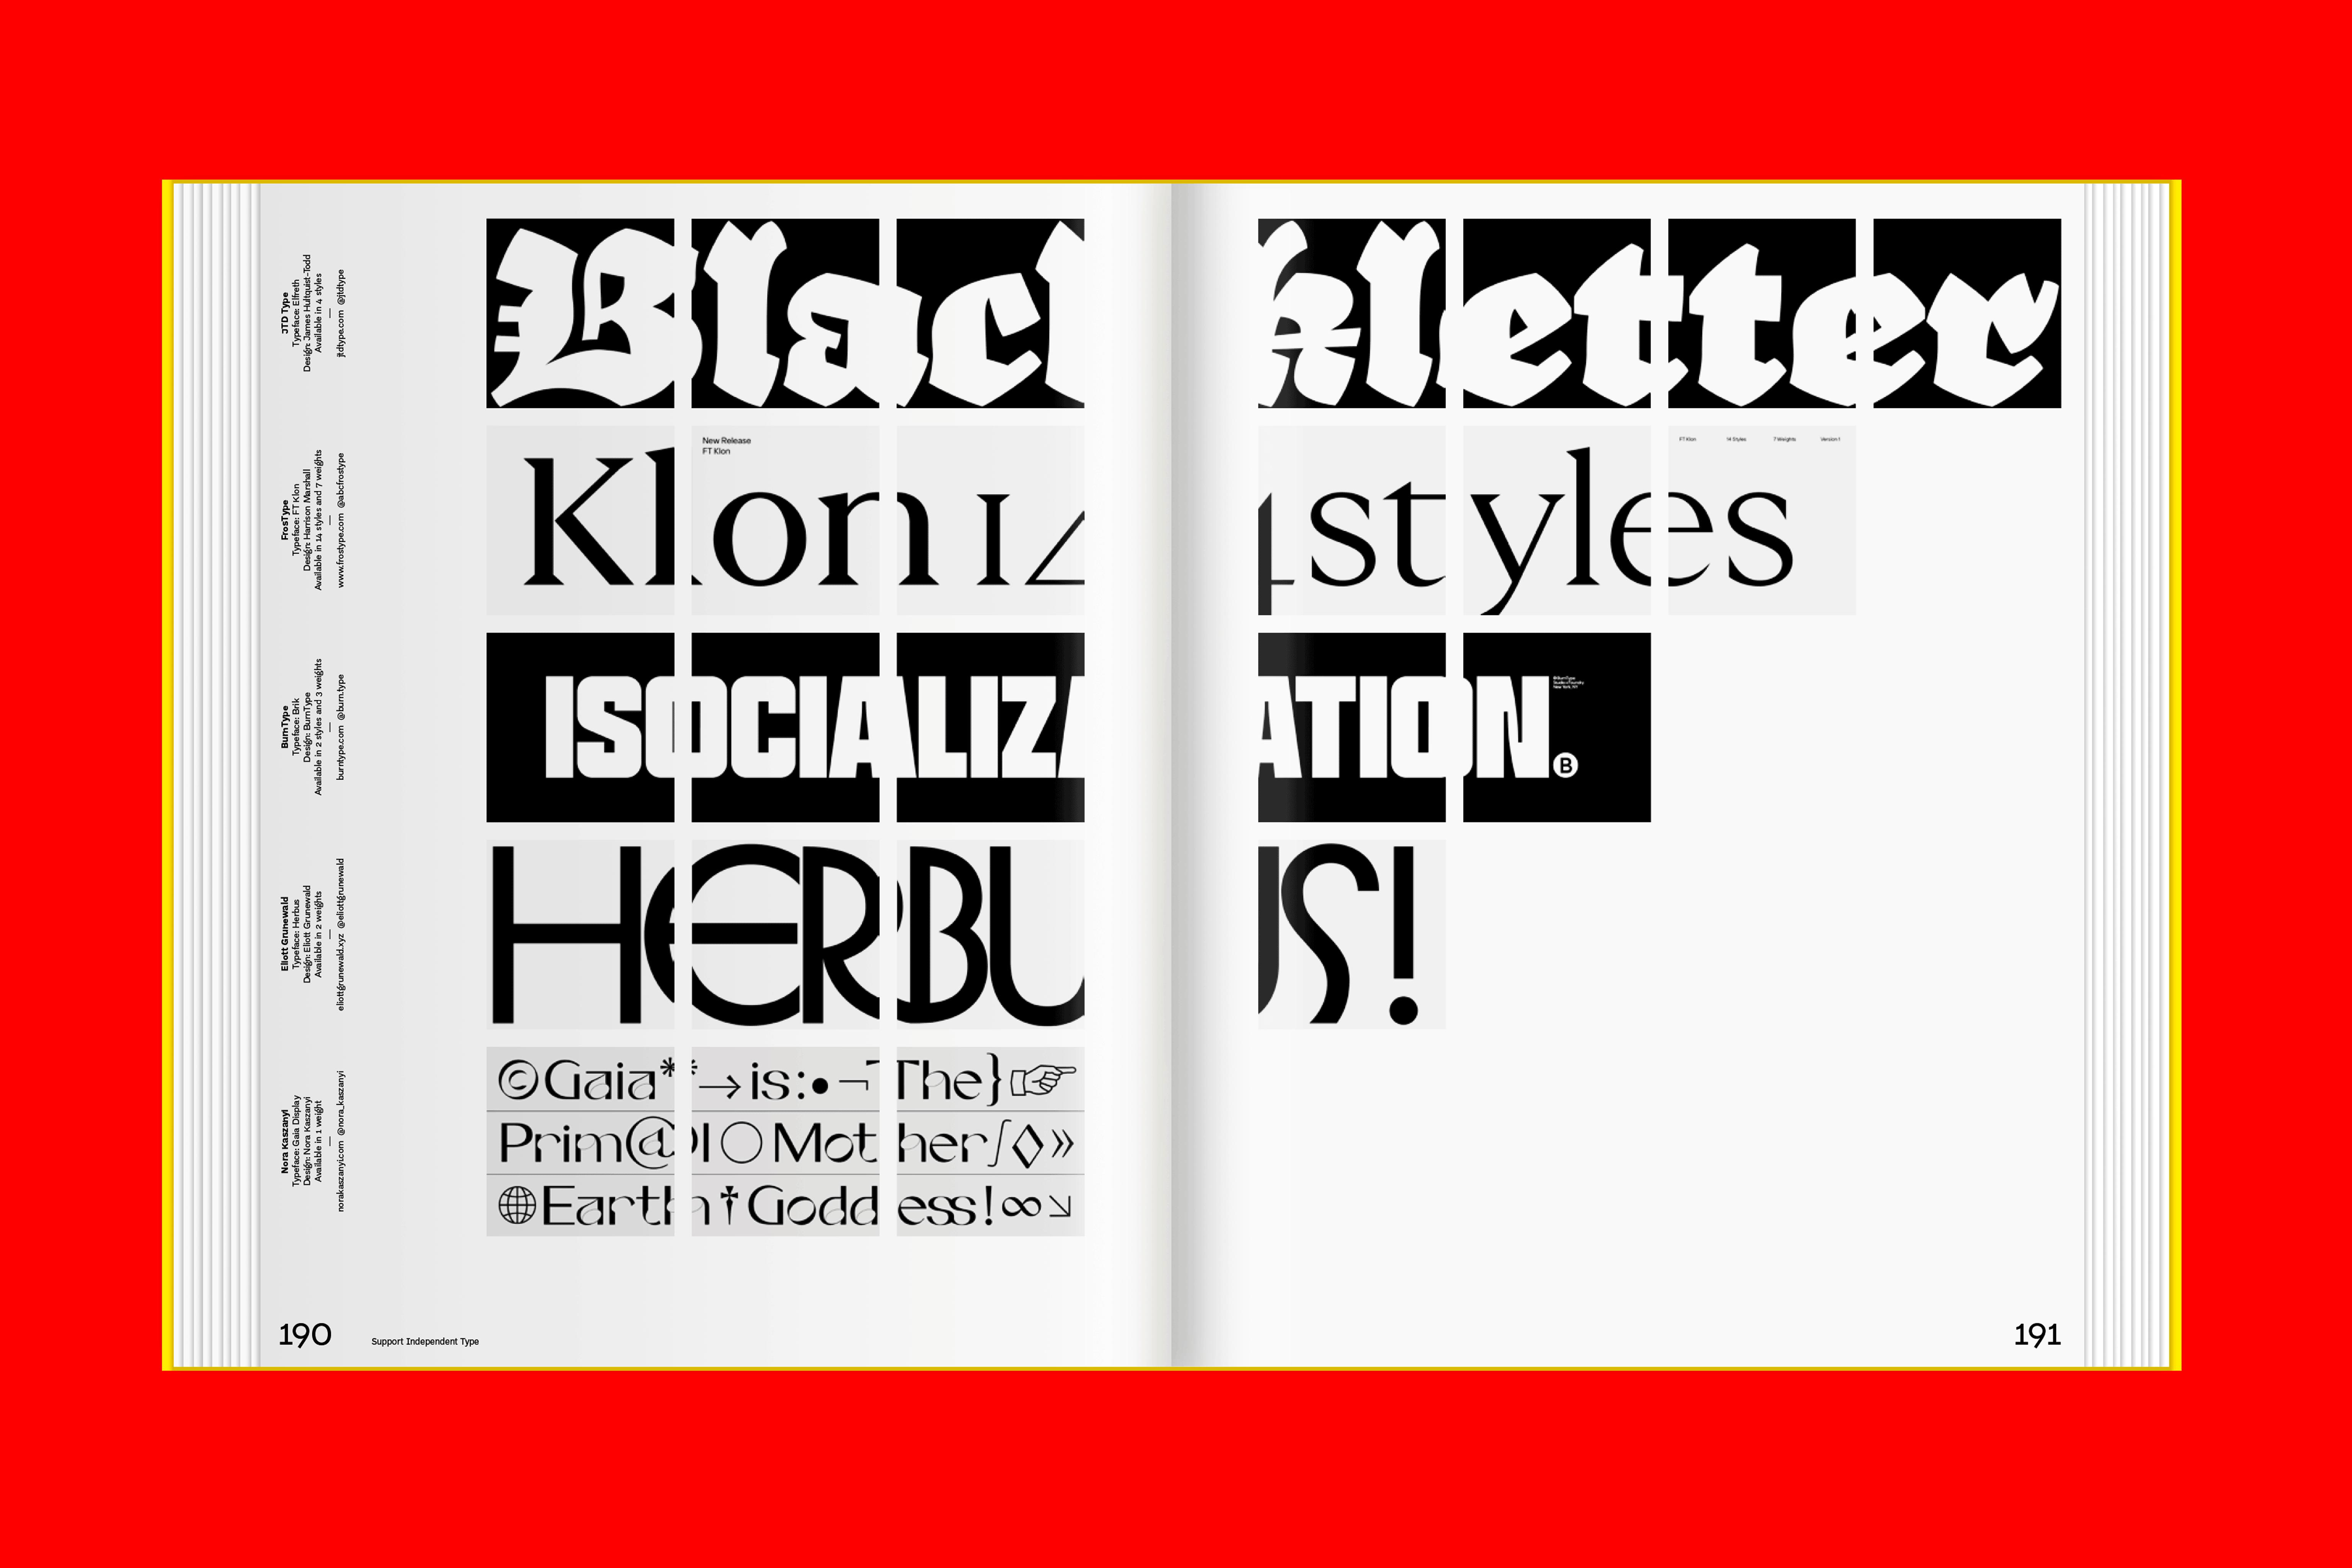 Slanted-Publiaktionen-Slanted-Publishers-Support-Independent-Type_23